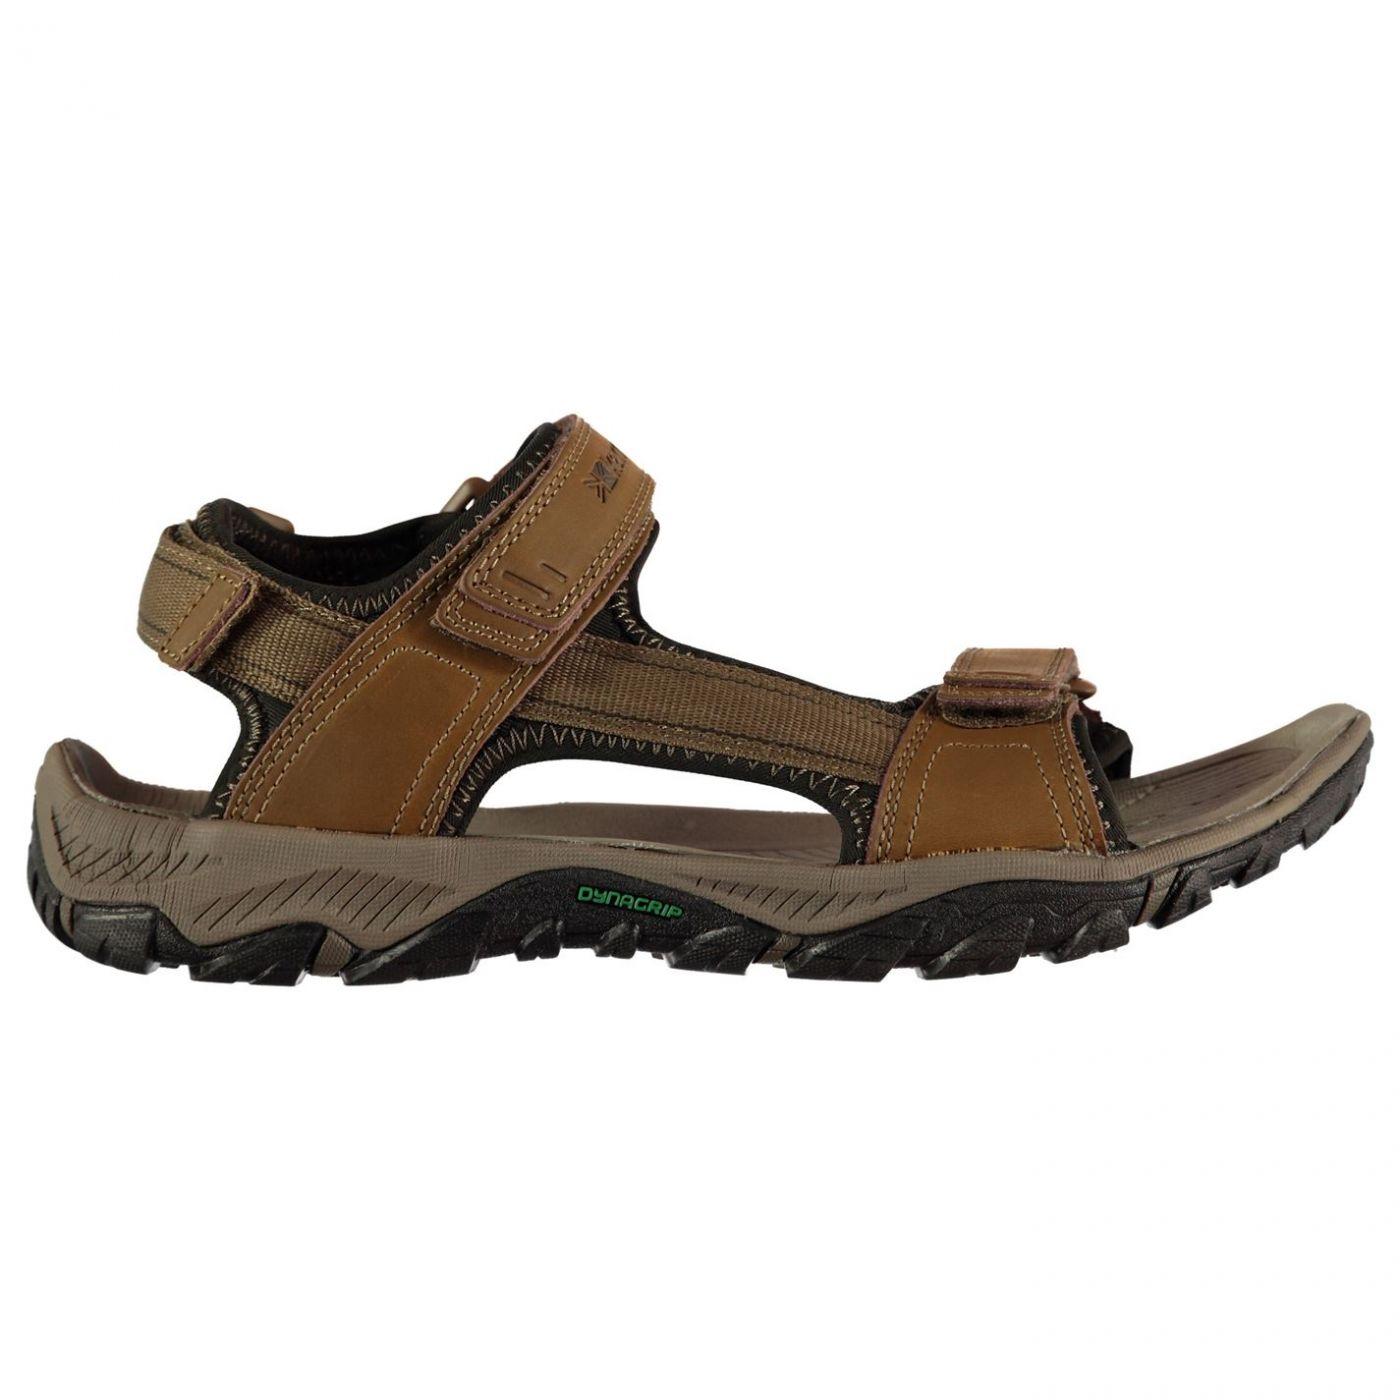 Karrimor Nihoa Mens Walking Sandals